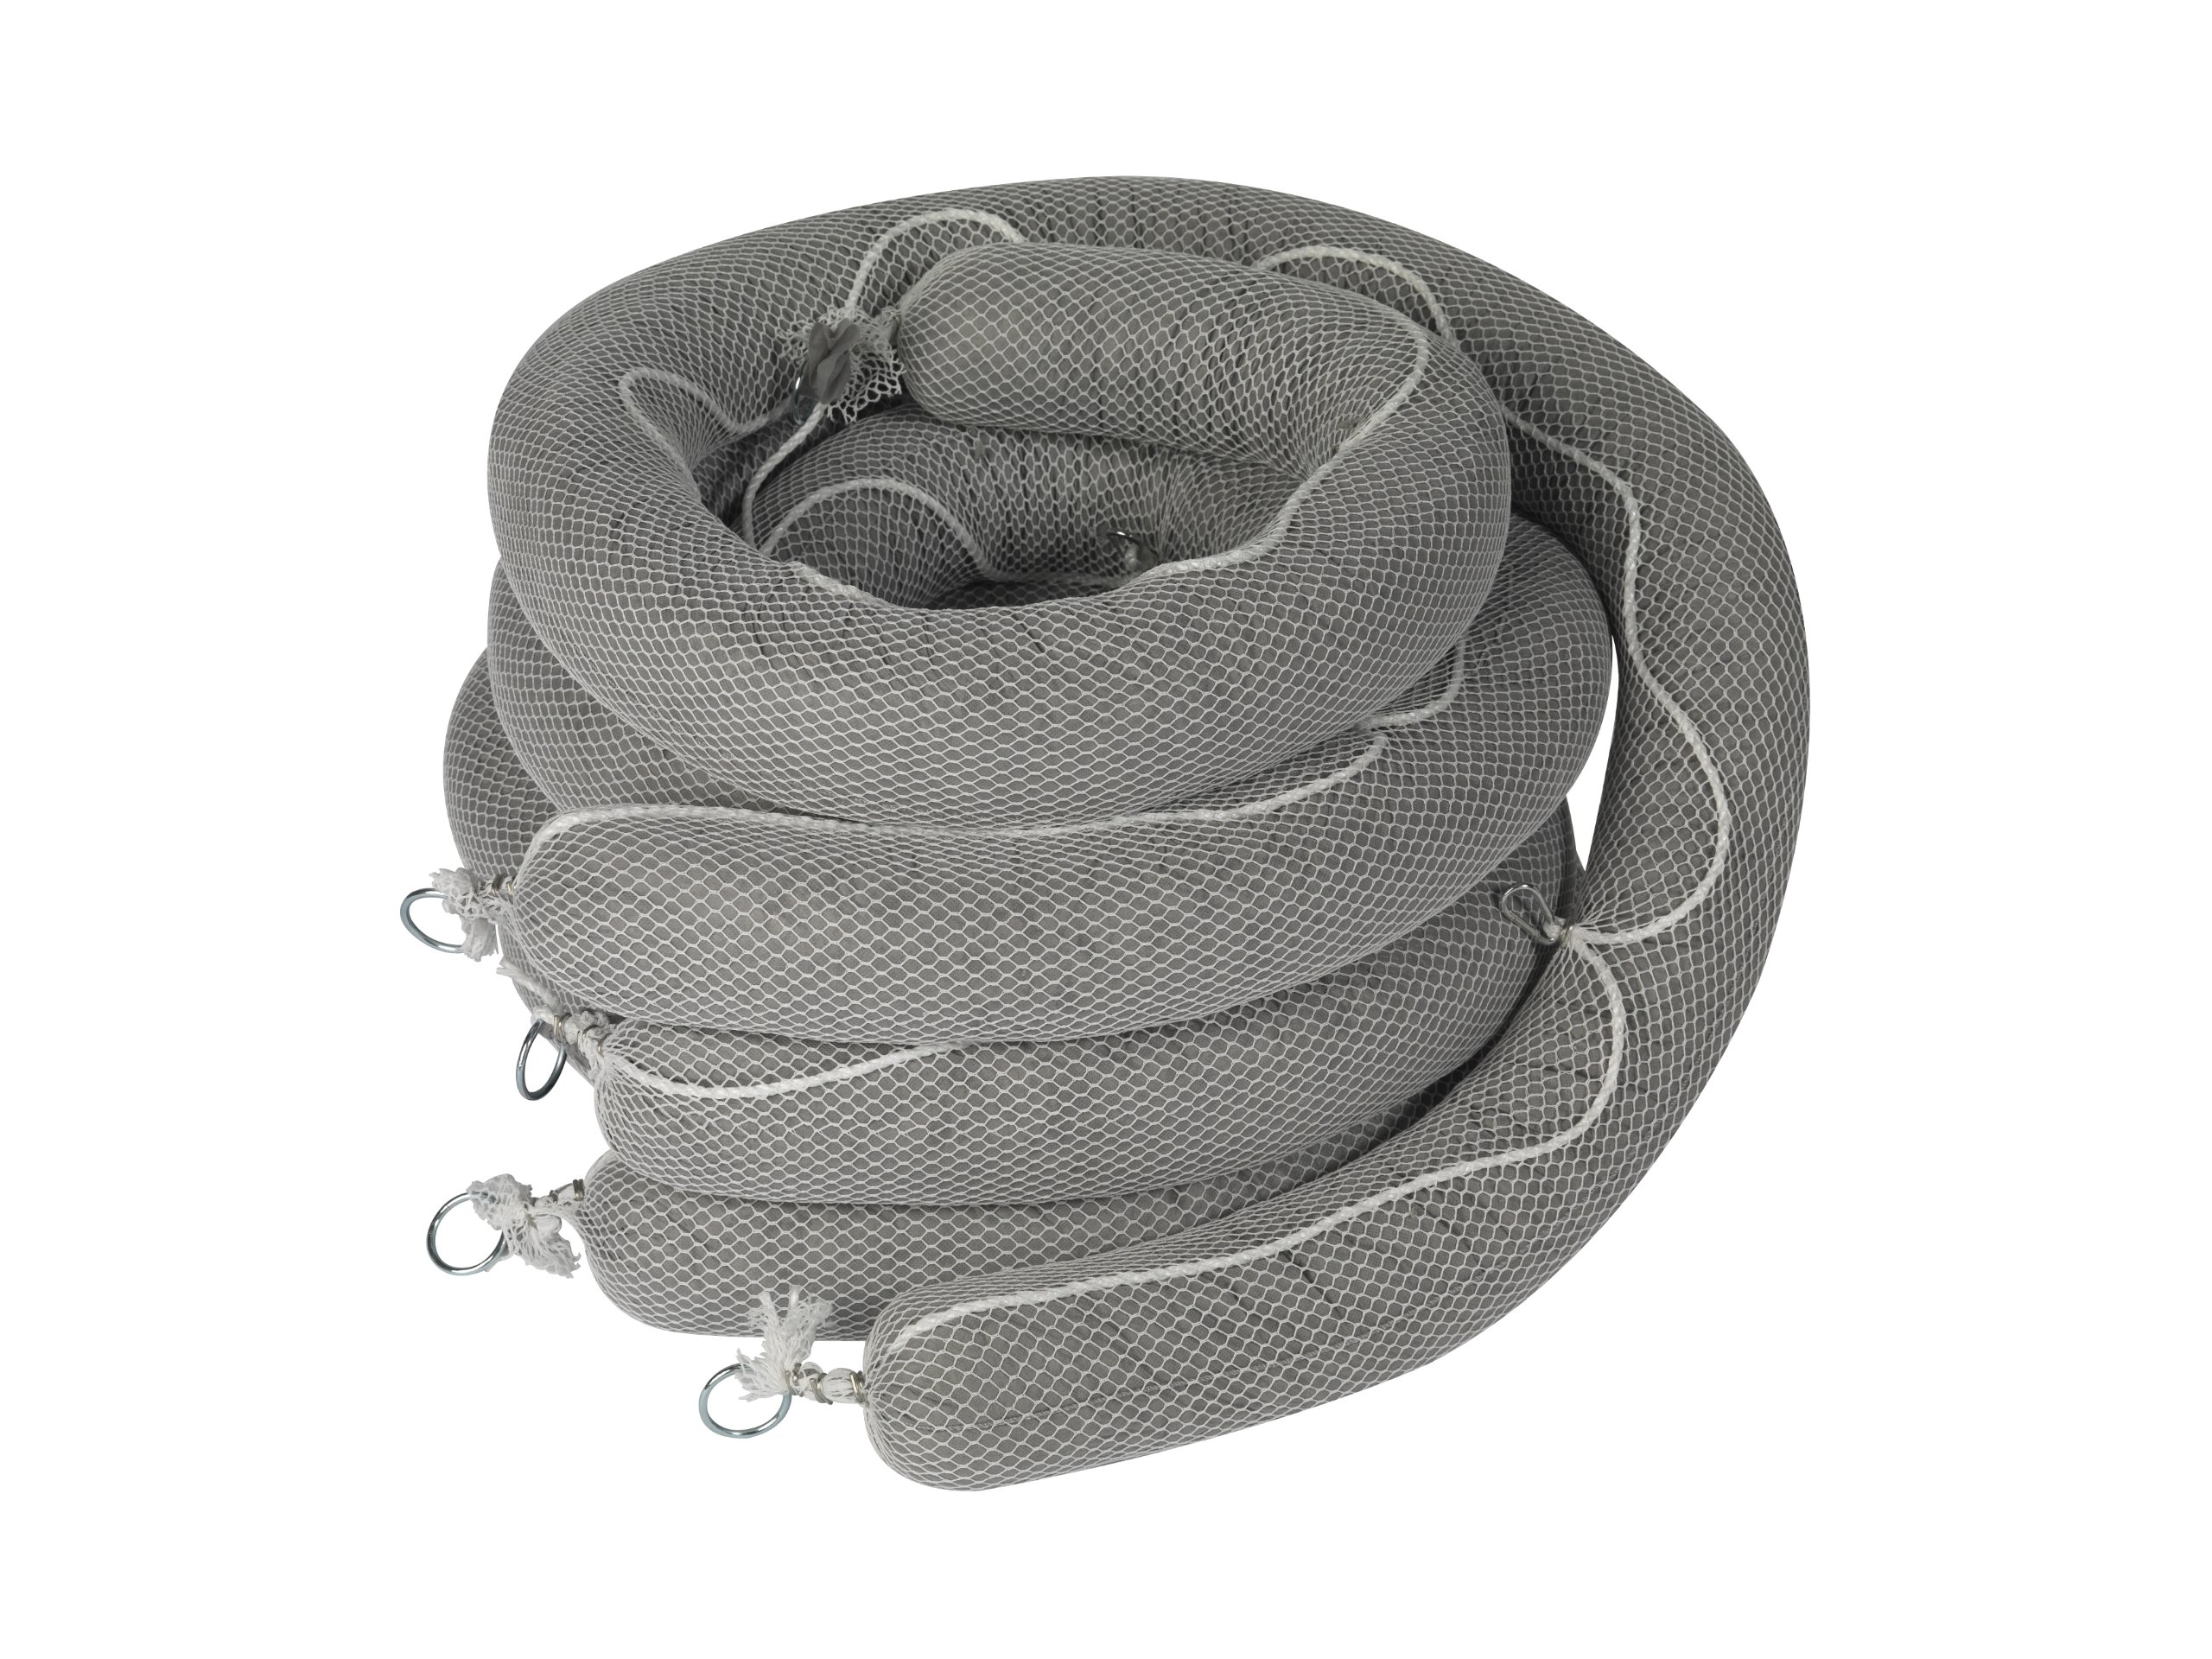 SPC UN510 Spill Control Universal Allwik Boom, Lint Free, 5'' x 10' (4 per Bale) by Brady SPC